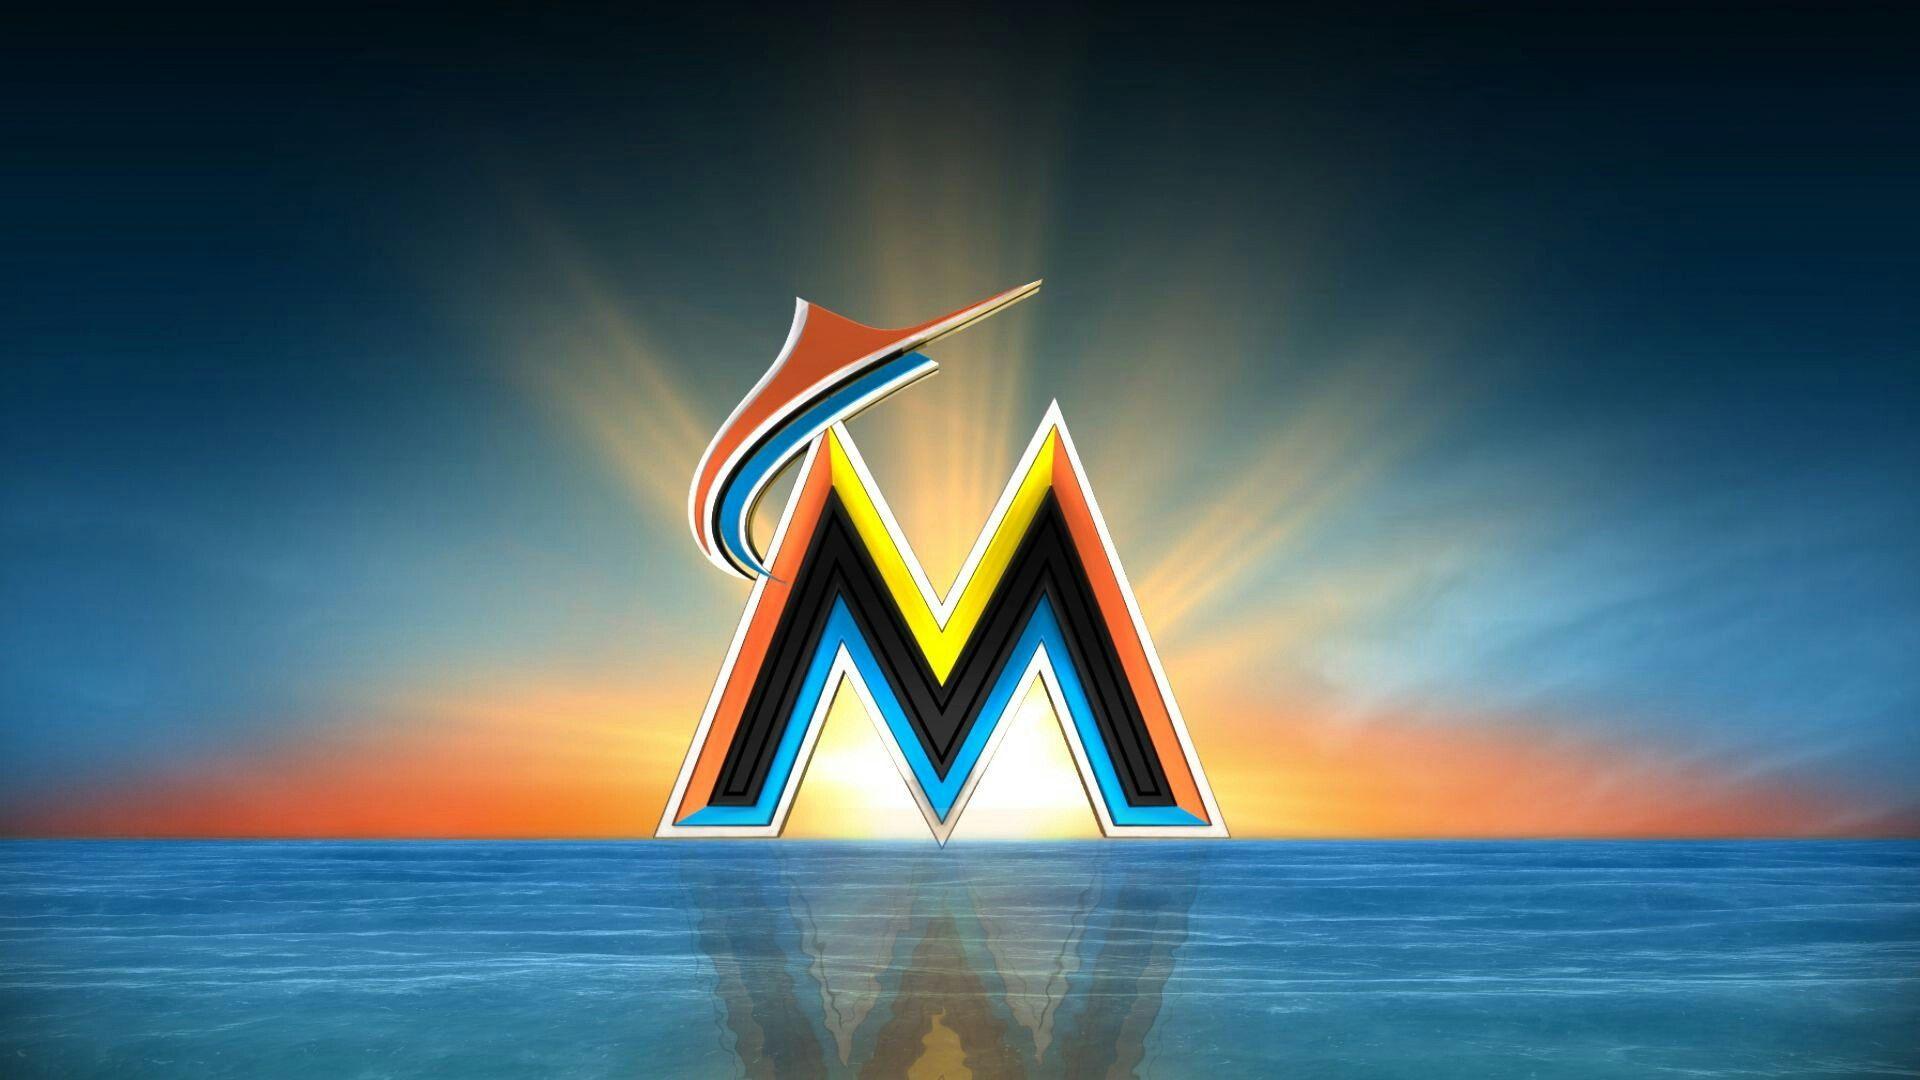 Miami Marlins Wallpaper